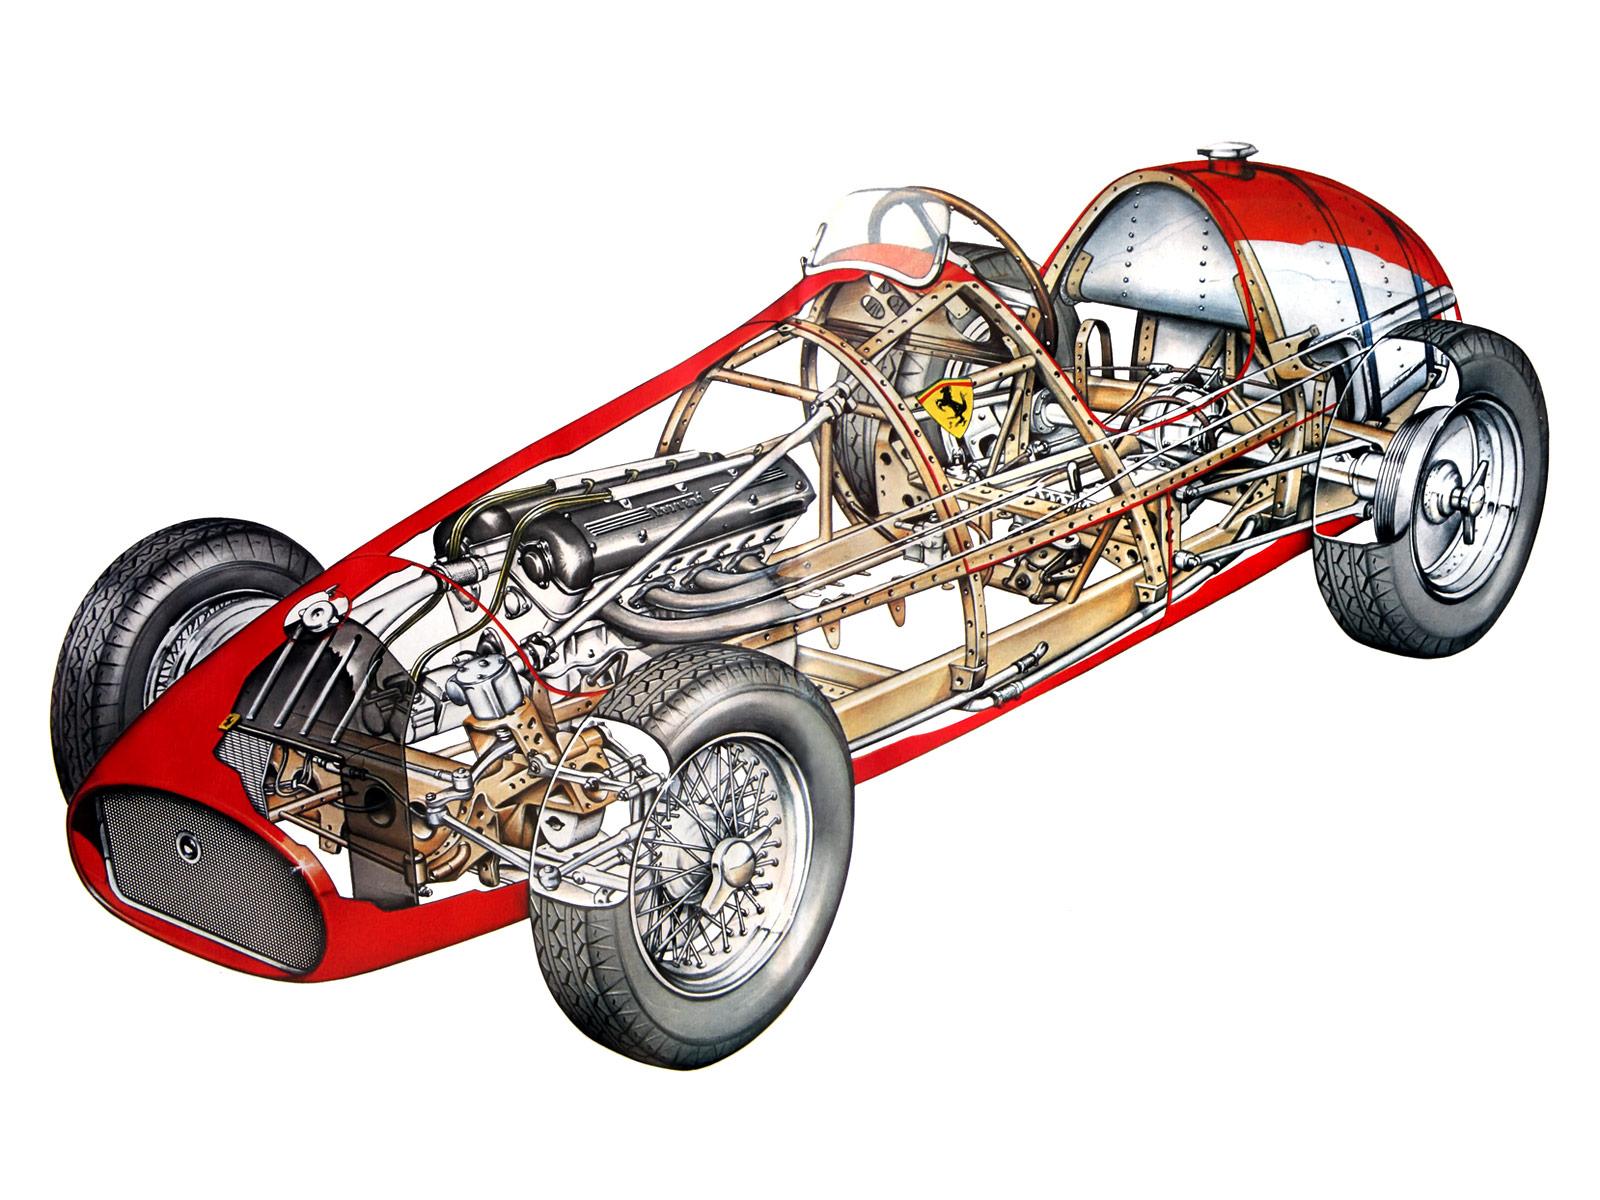 Ferrari 500 cutaway